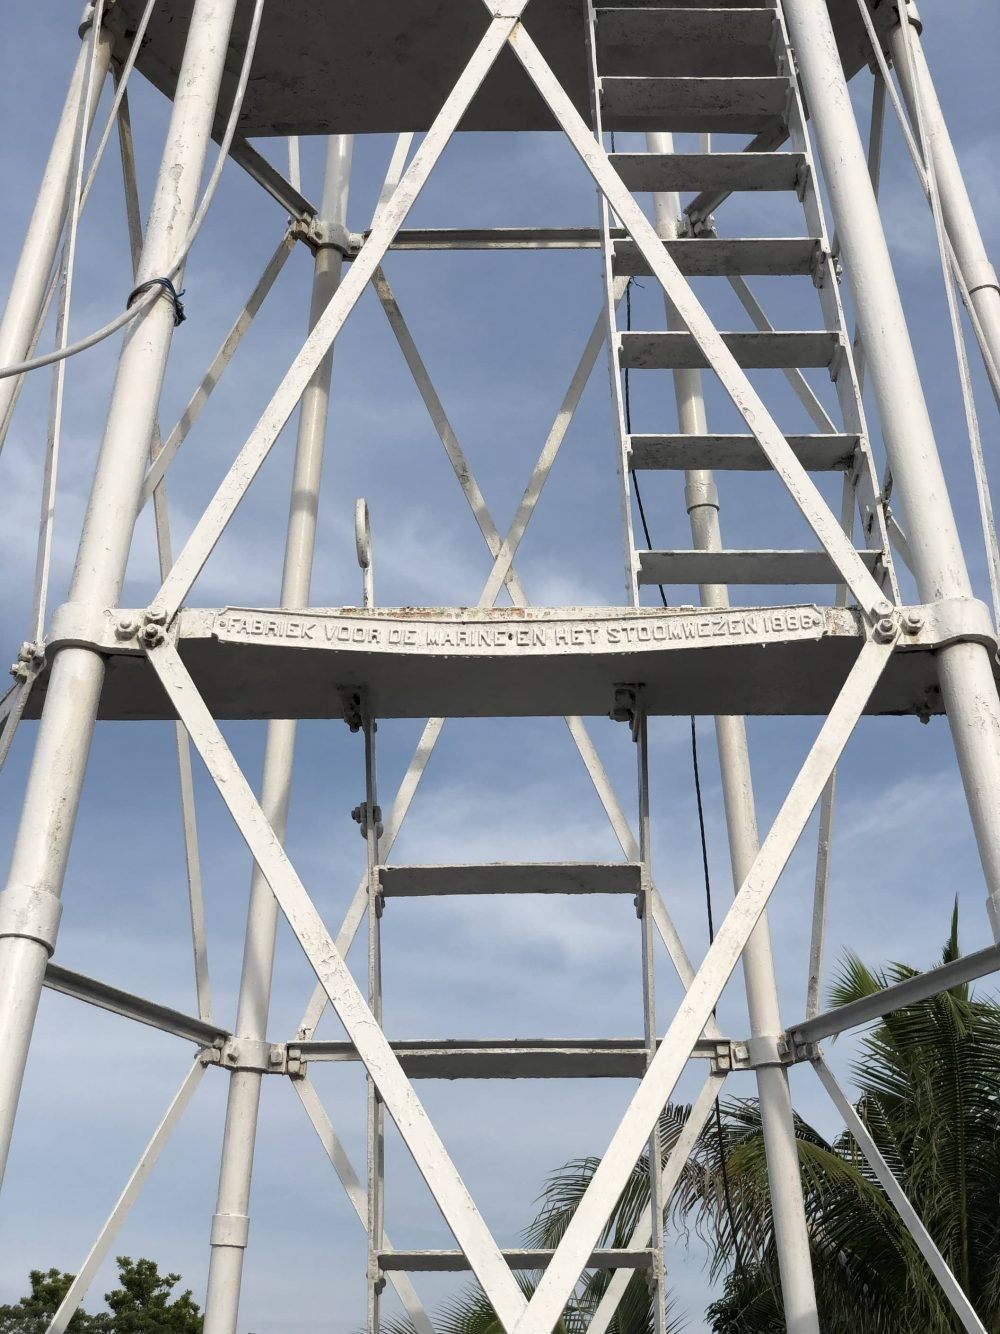 Memahami Nusantara dari Pulau Anak Karas (Kepri)